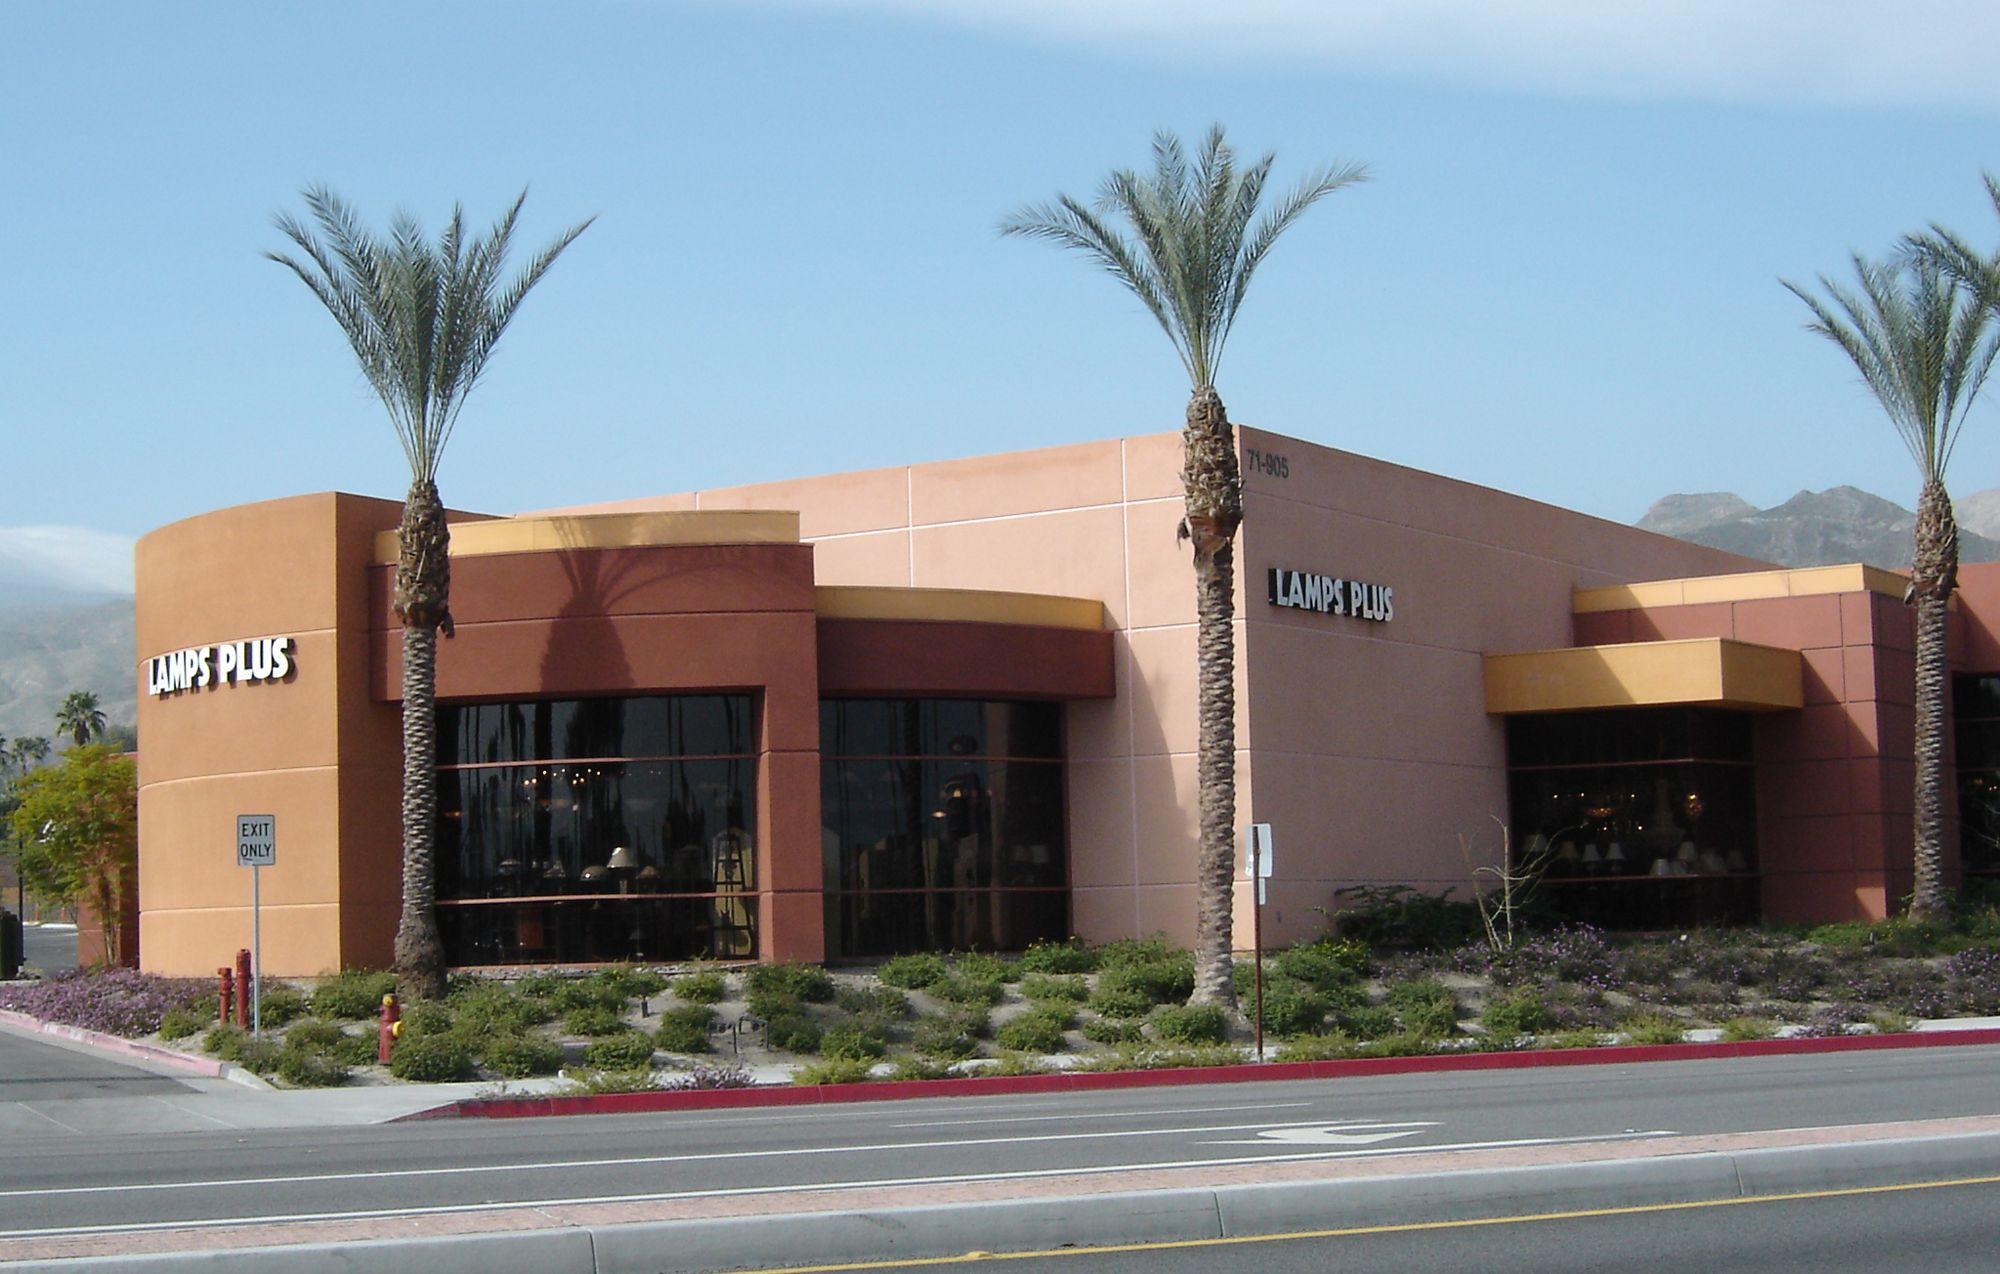 Lamps Plus Rancho Mirage CA #46